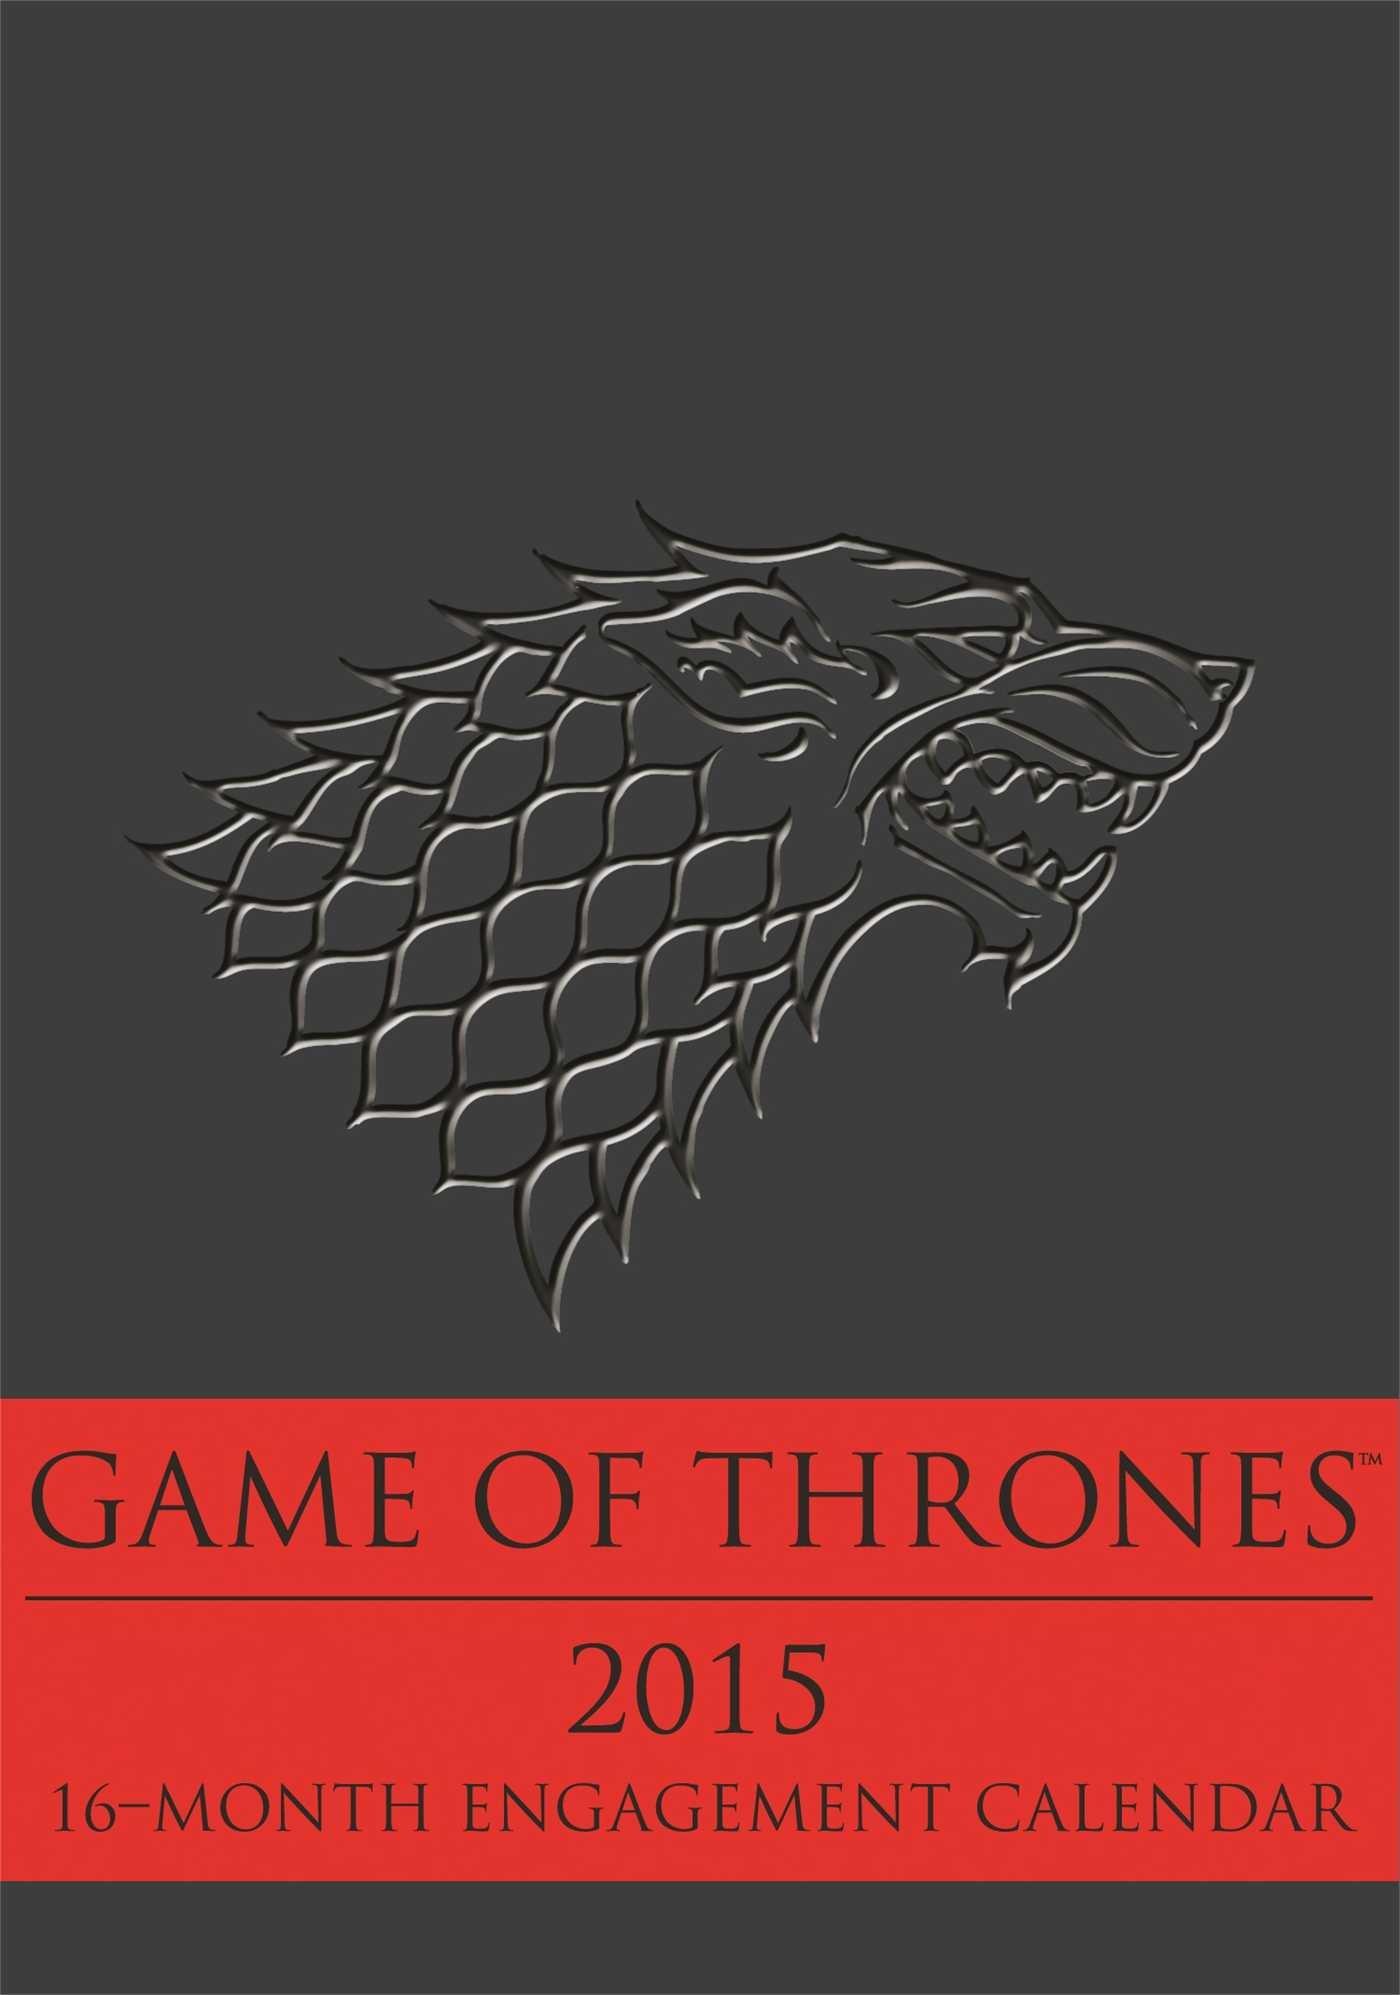 Game of Thrones 2015 16-Month Engagement Calendar: Amazon.es ...